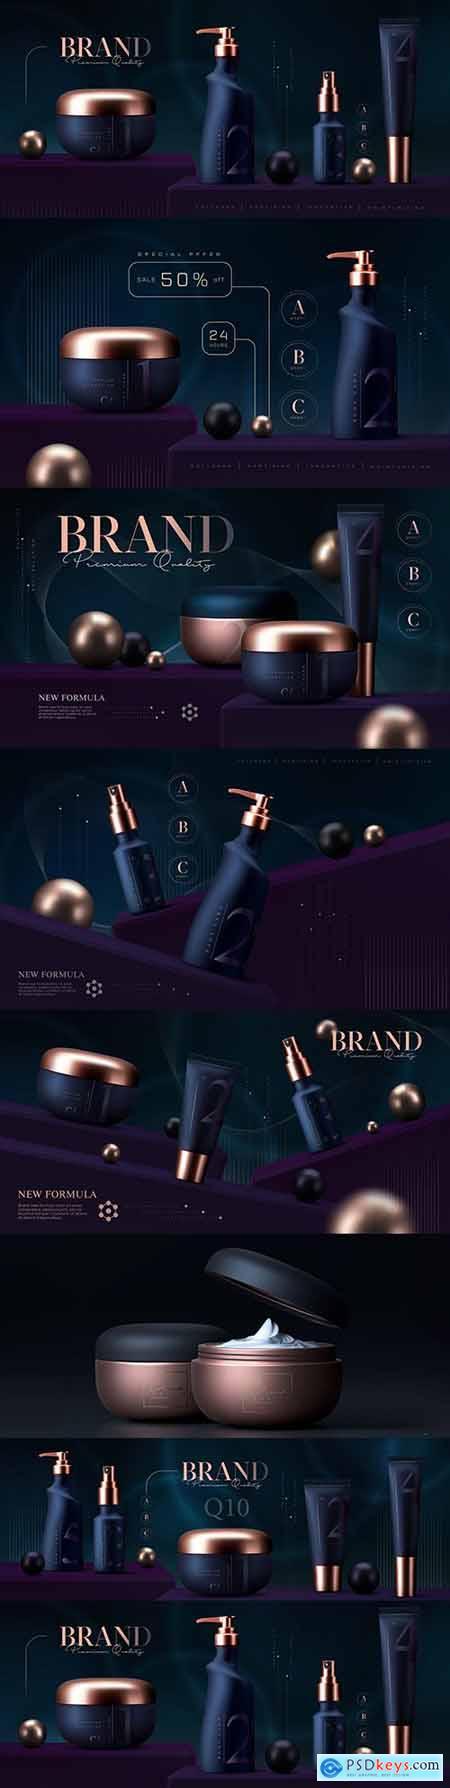 Cosmetic cream and skin care makeup luxury 3d premium template